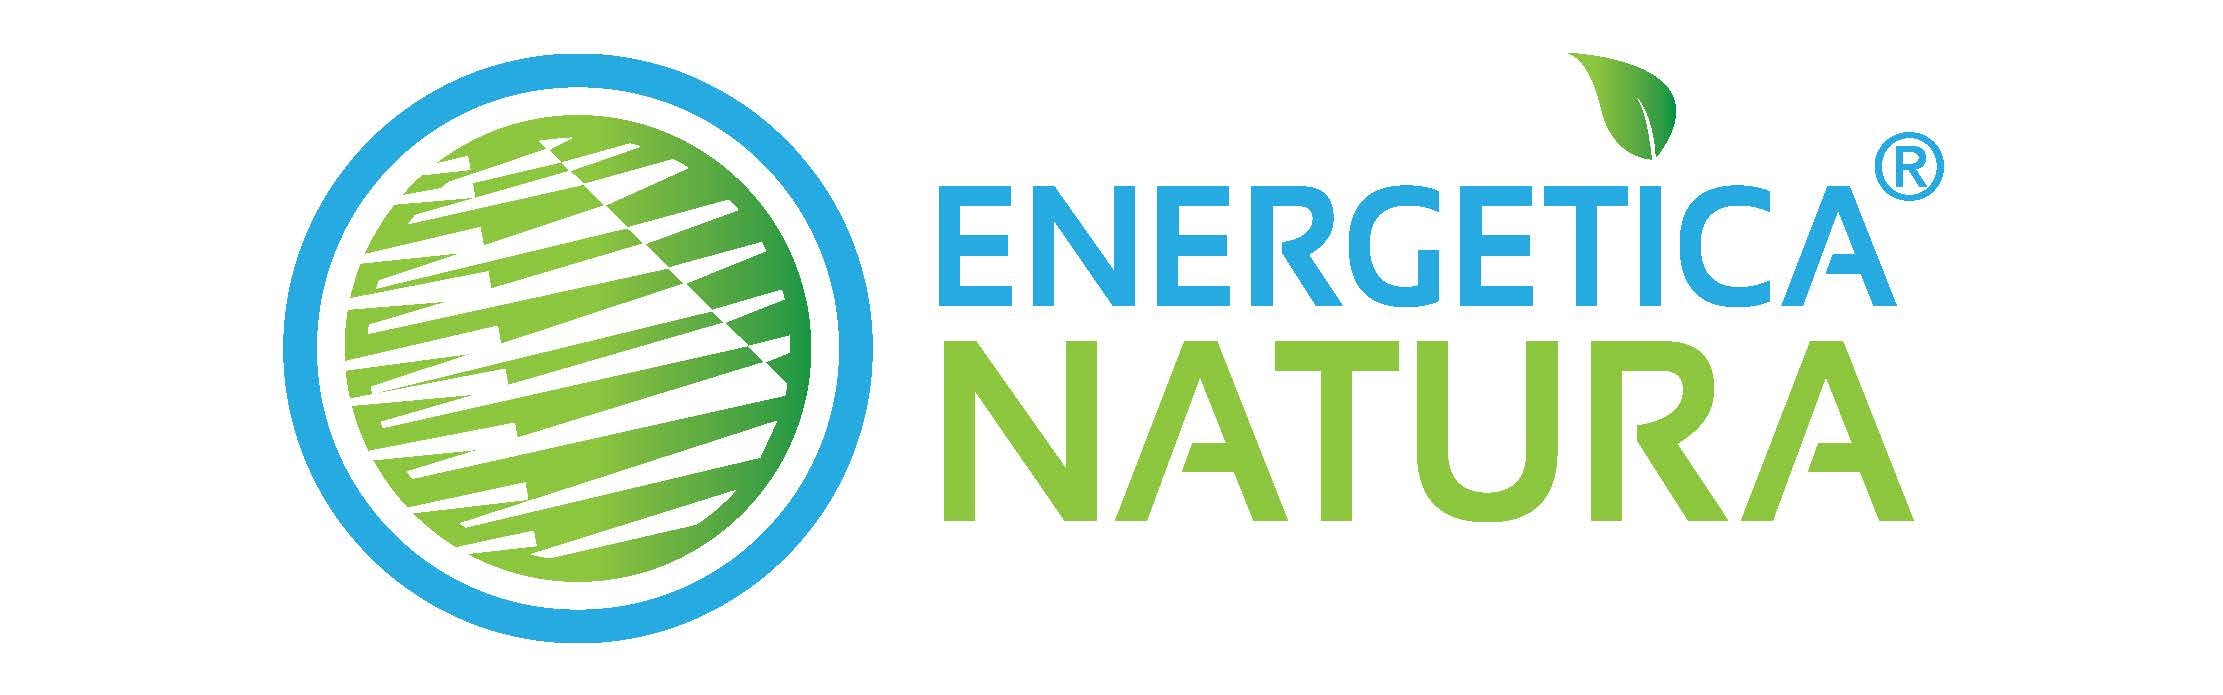 energetica_natura_banner800x250